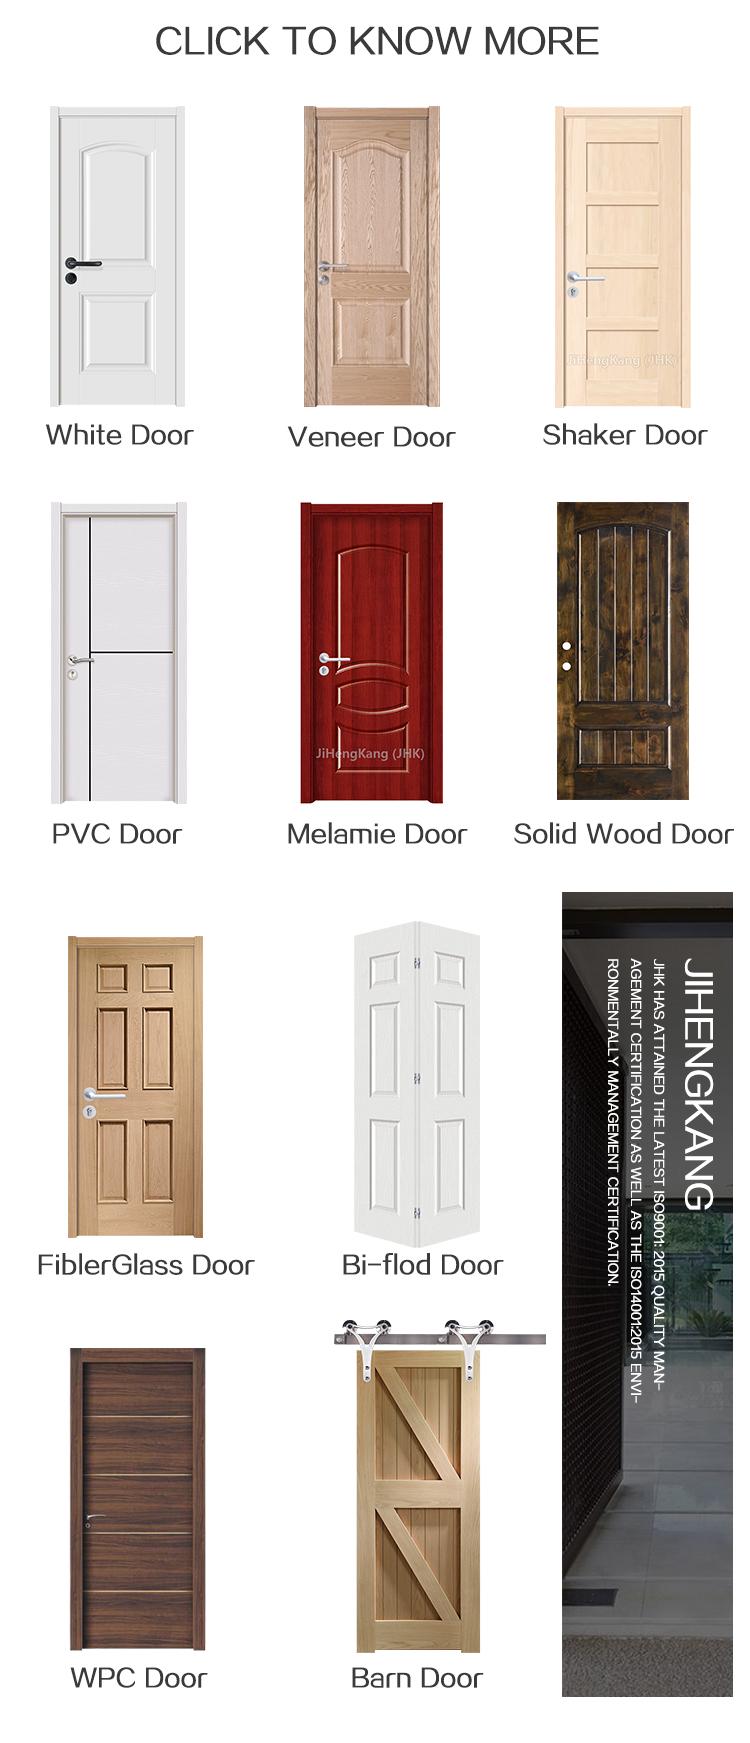 JHK-blanco de PVC de chapa de melamina de WPC de la puerta de madera